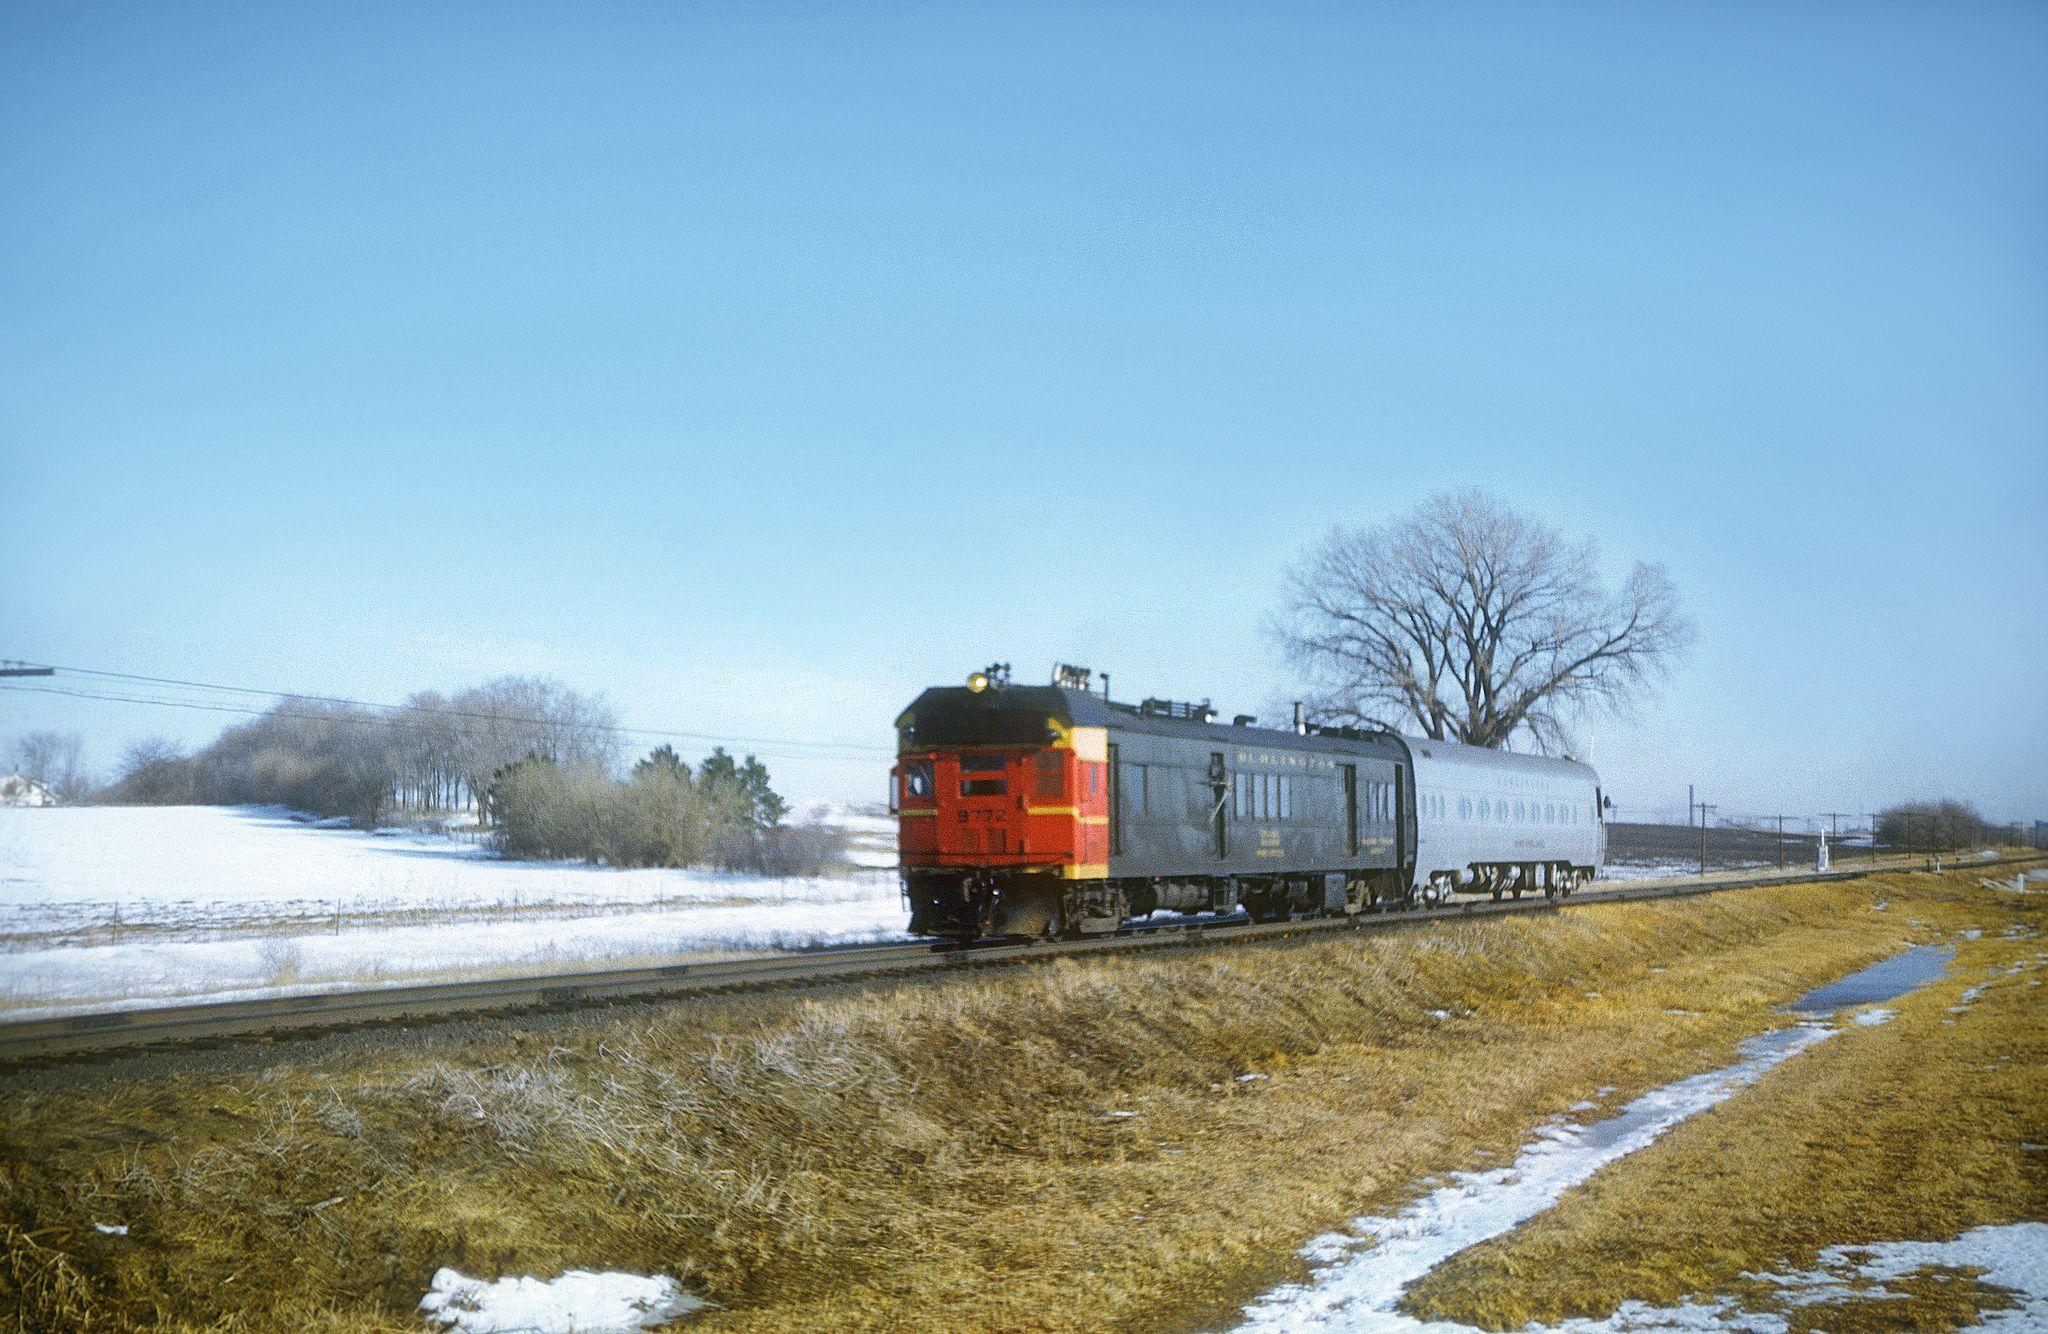 Cbq pmc 9772 passenger days in february burlington